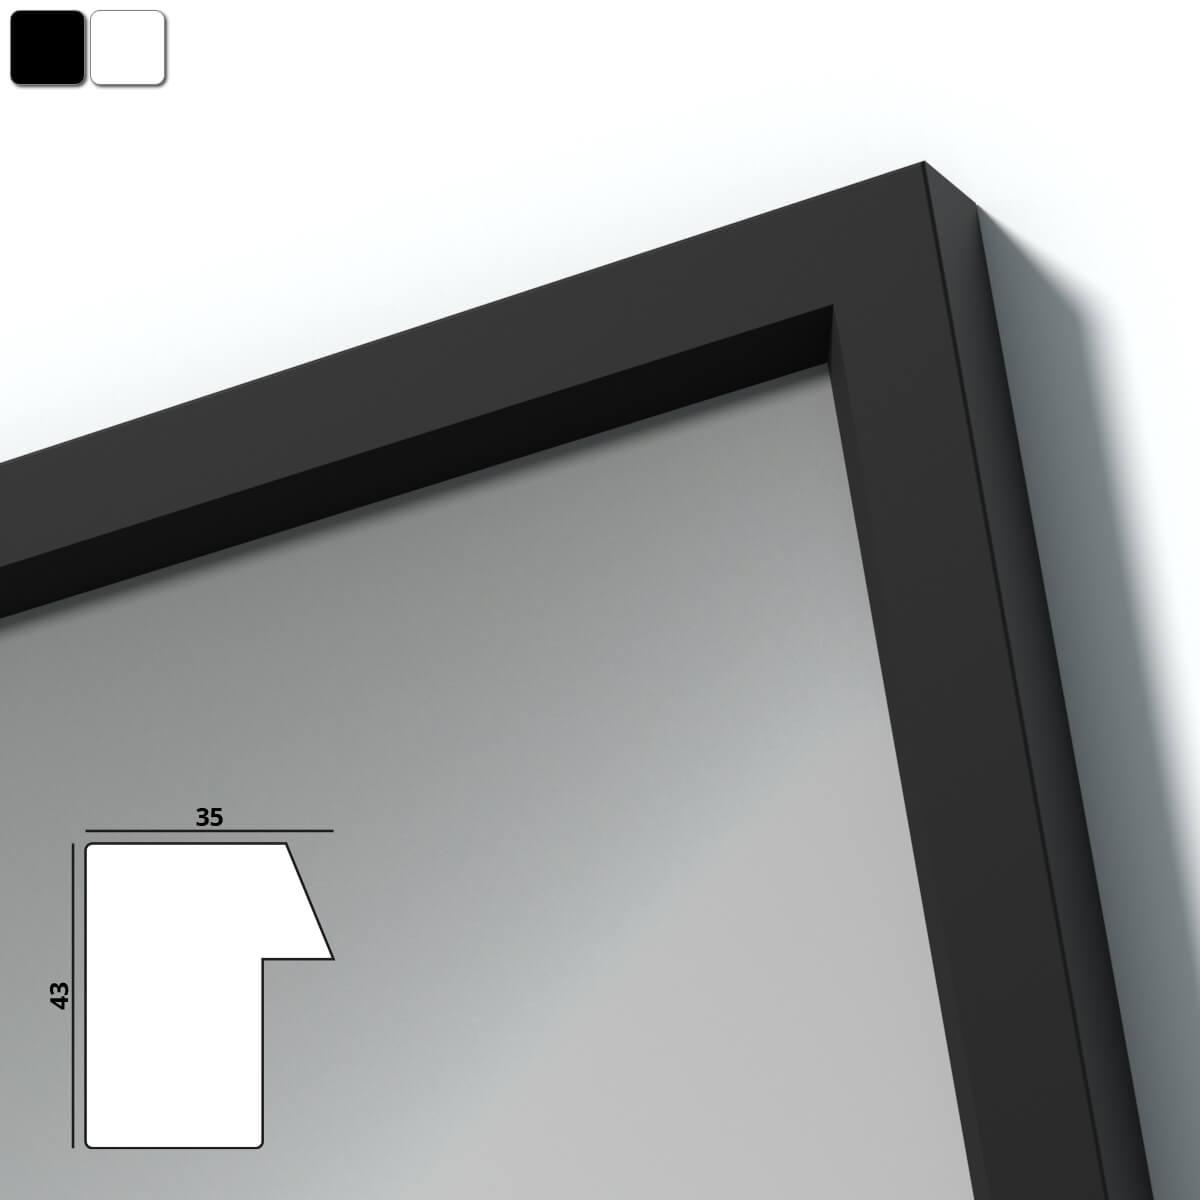 spiegel mit holzrahmen nach ma elbe 989709712. Black Bedroom Furniture Sets. Home Design Ideas